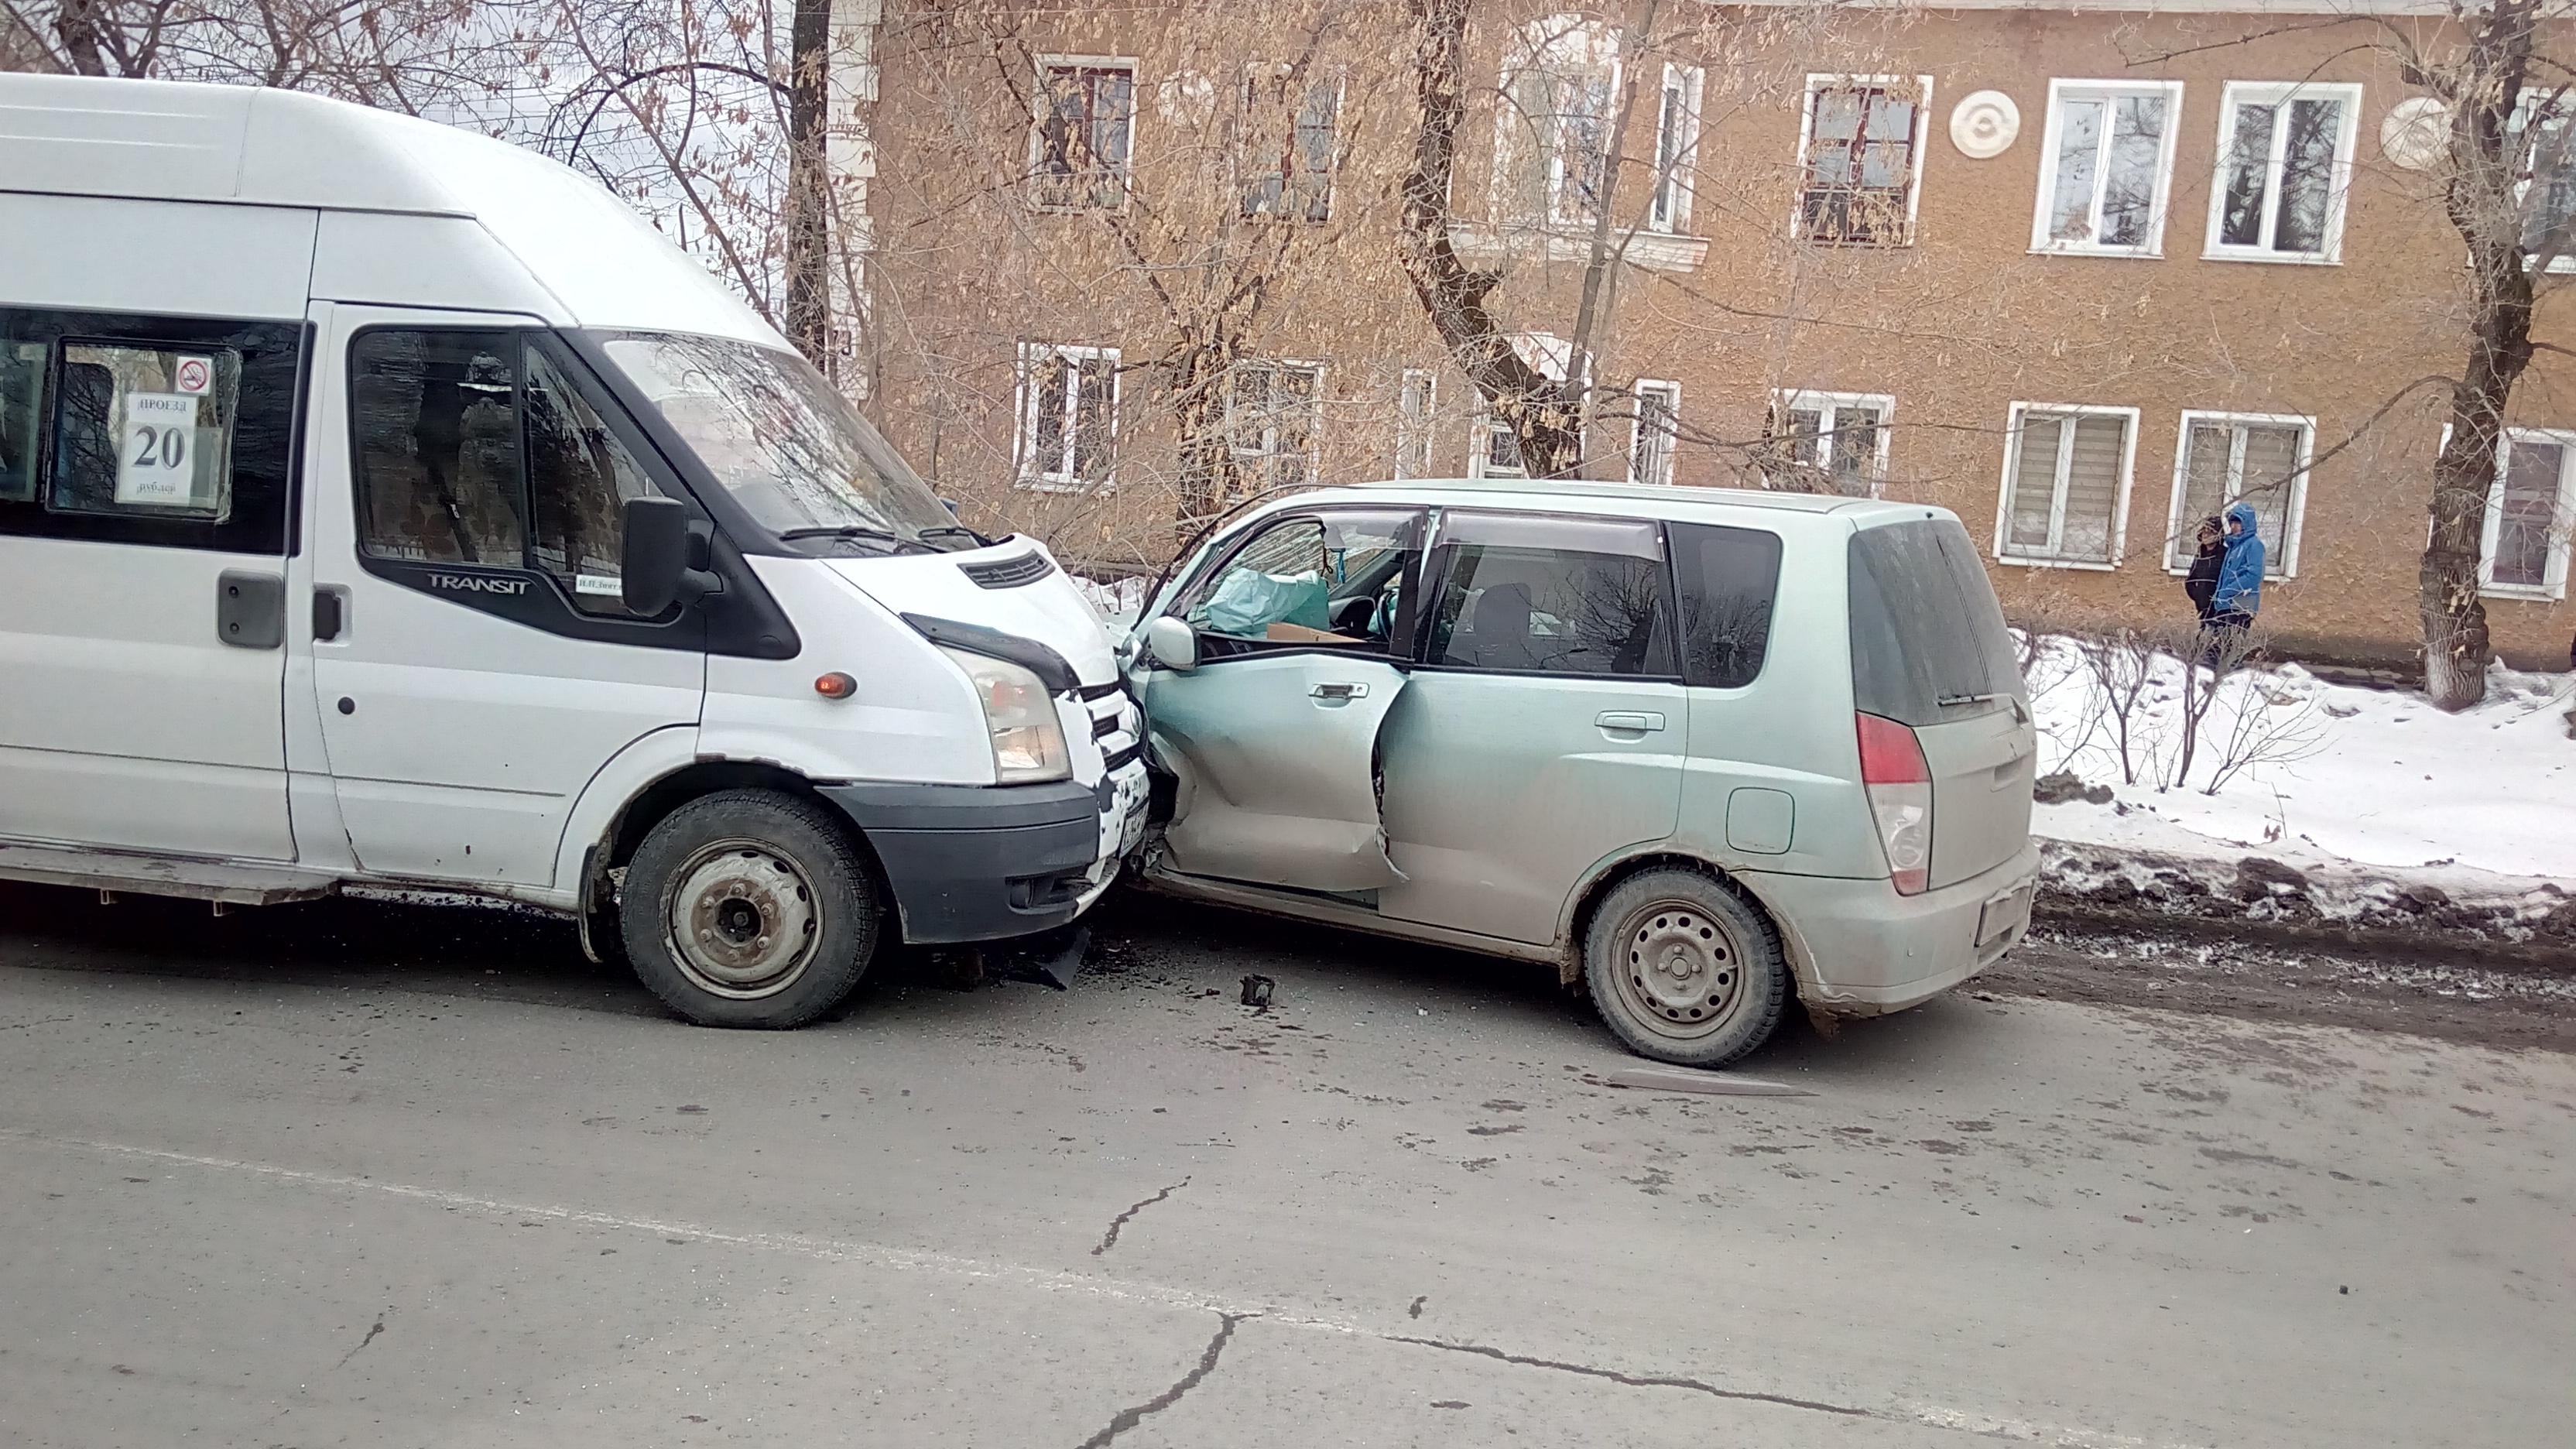 ВРевде, уснув зарулем, шофёр маршрутки спровоцировал ДТП: пострадали 2 человека